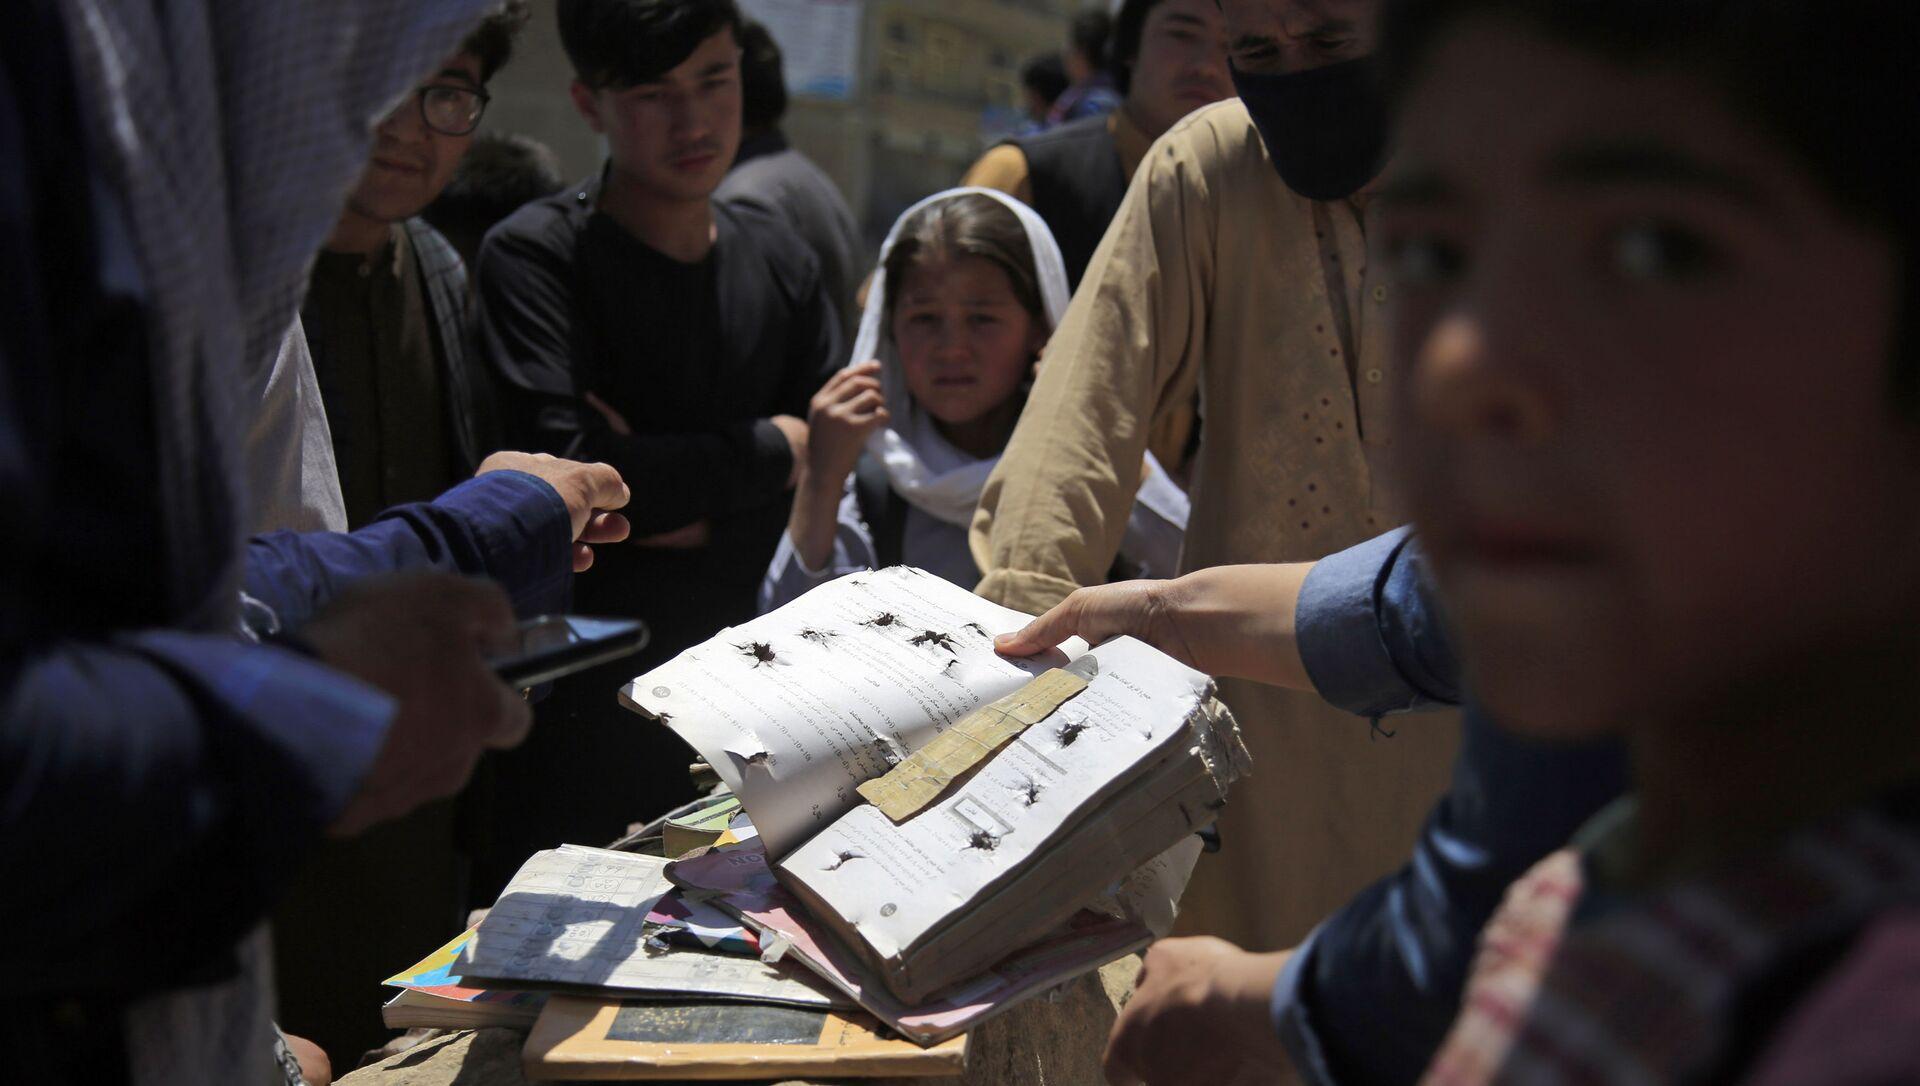 Afghans go through belongings left behind after deadly bombings on Saturday near a school in Kabul, Afghanistan, 9 May 2021.  - Sputnik International, 1920, 26.07.2021